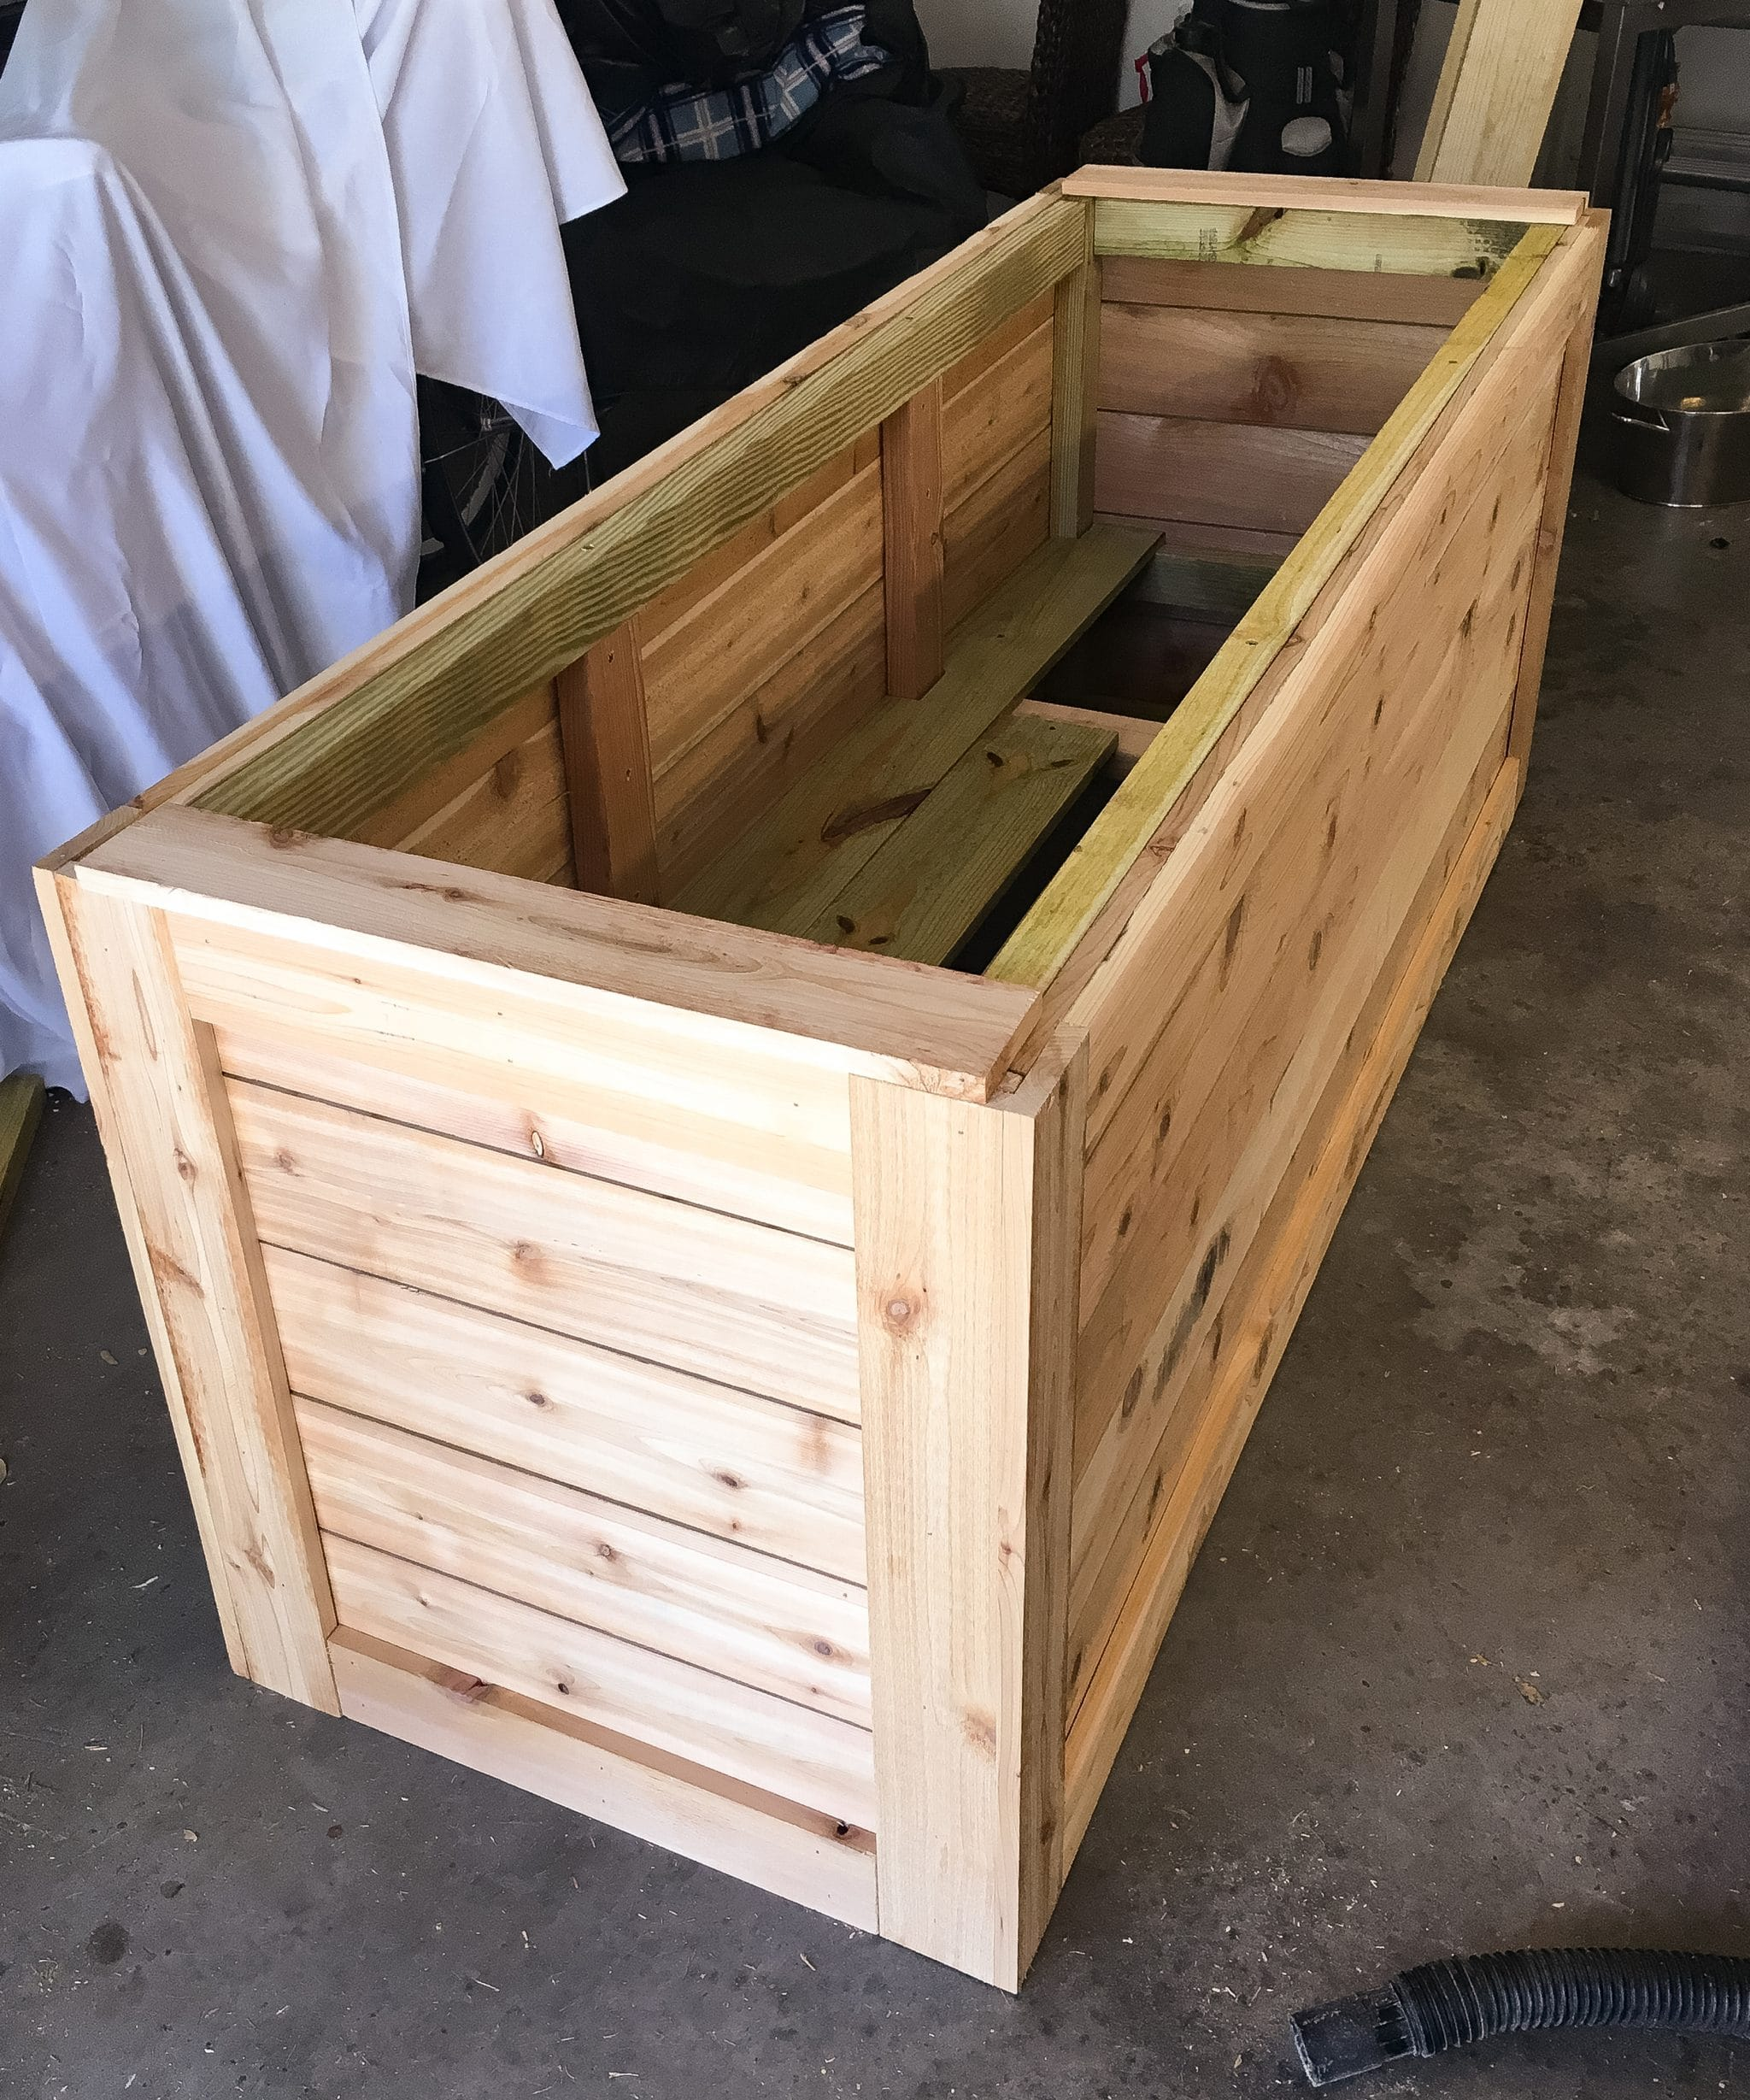 Ryan Chambers Shares How To Build A Diy Backyard Cedar